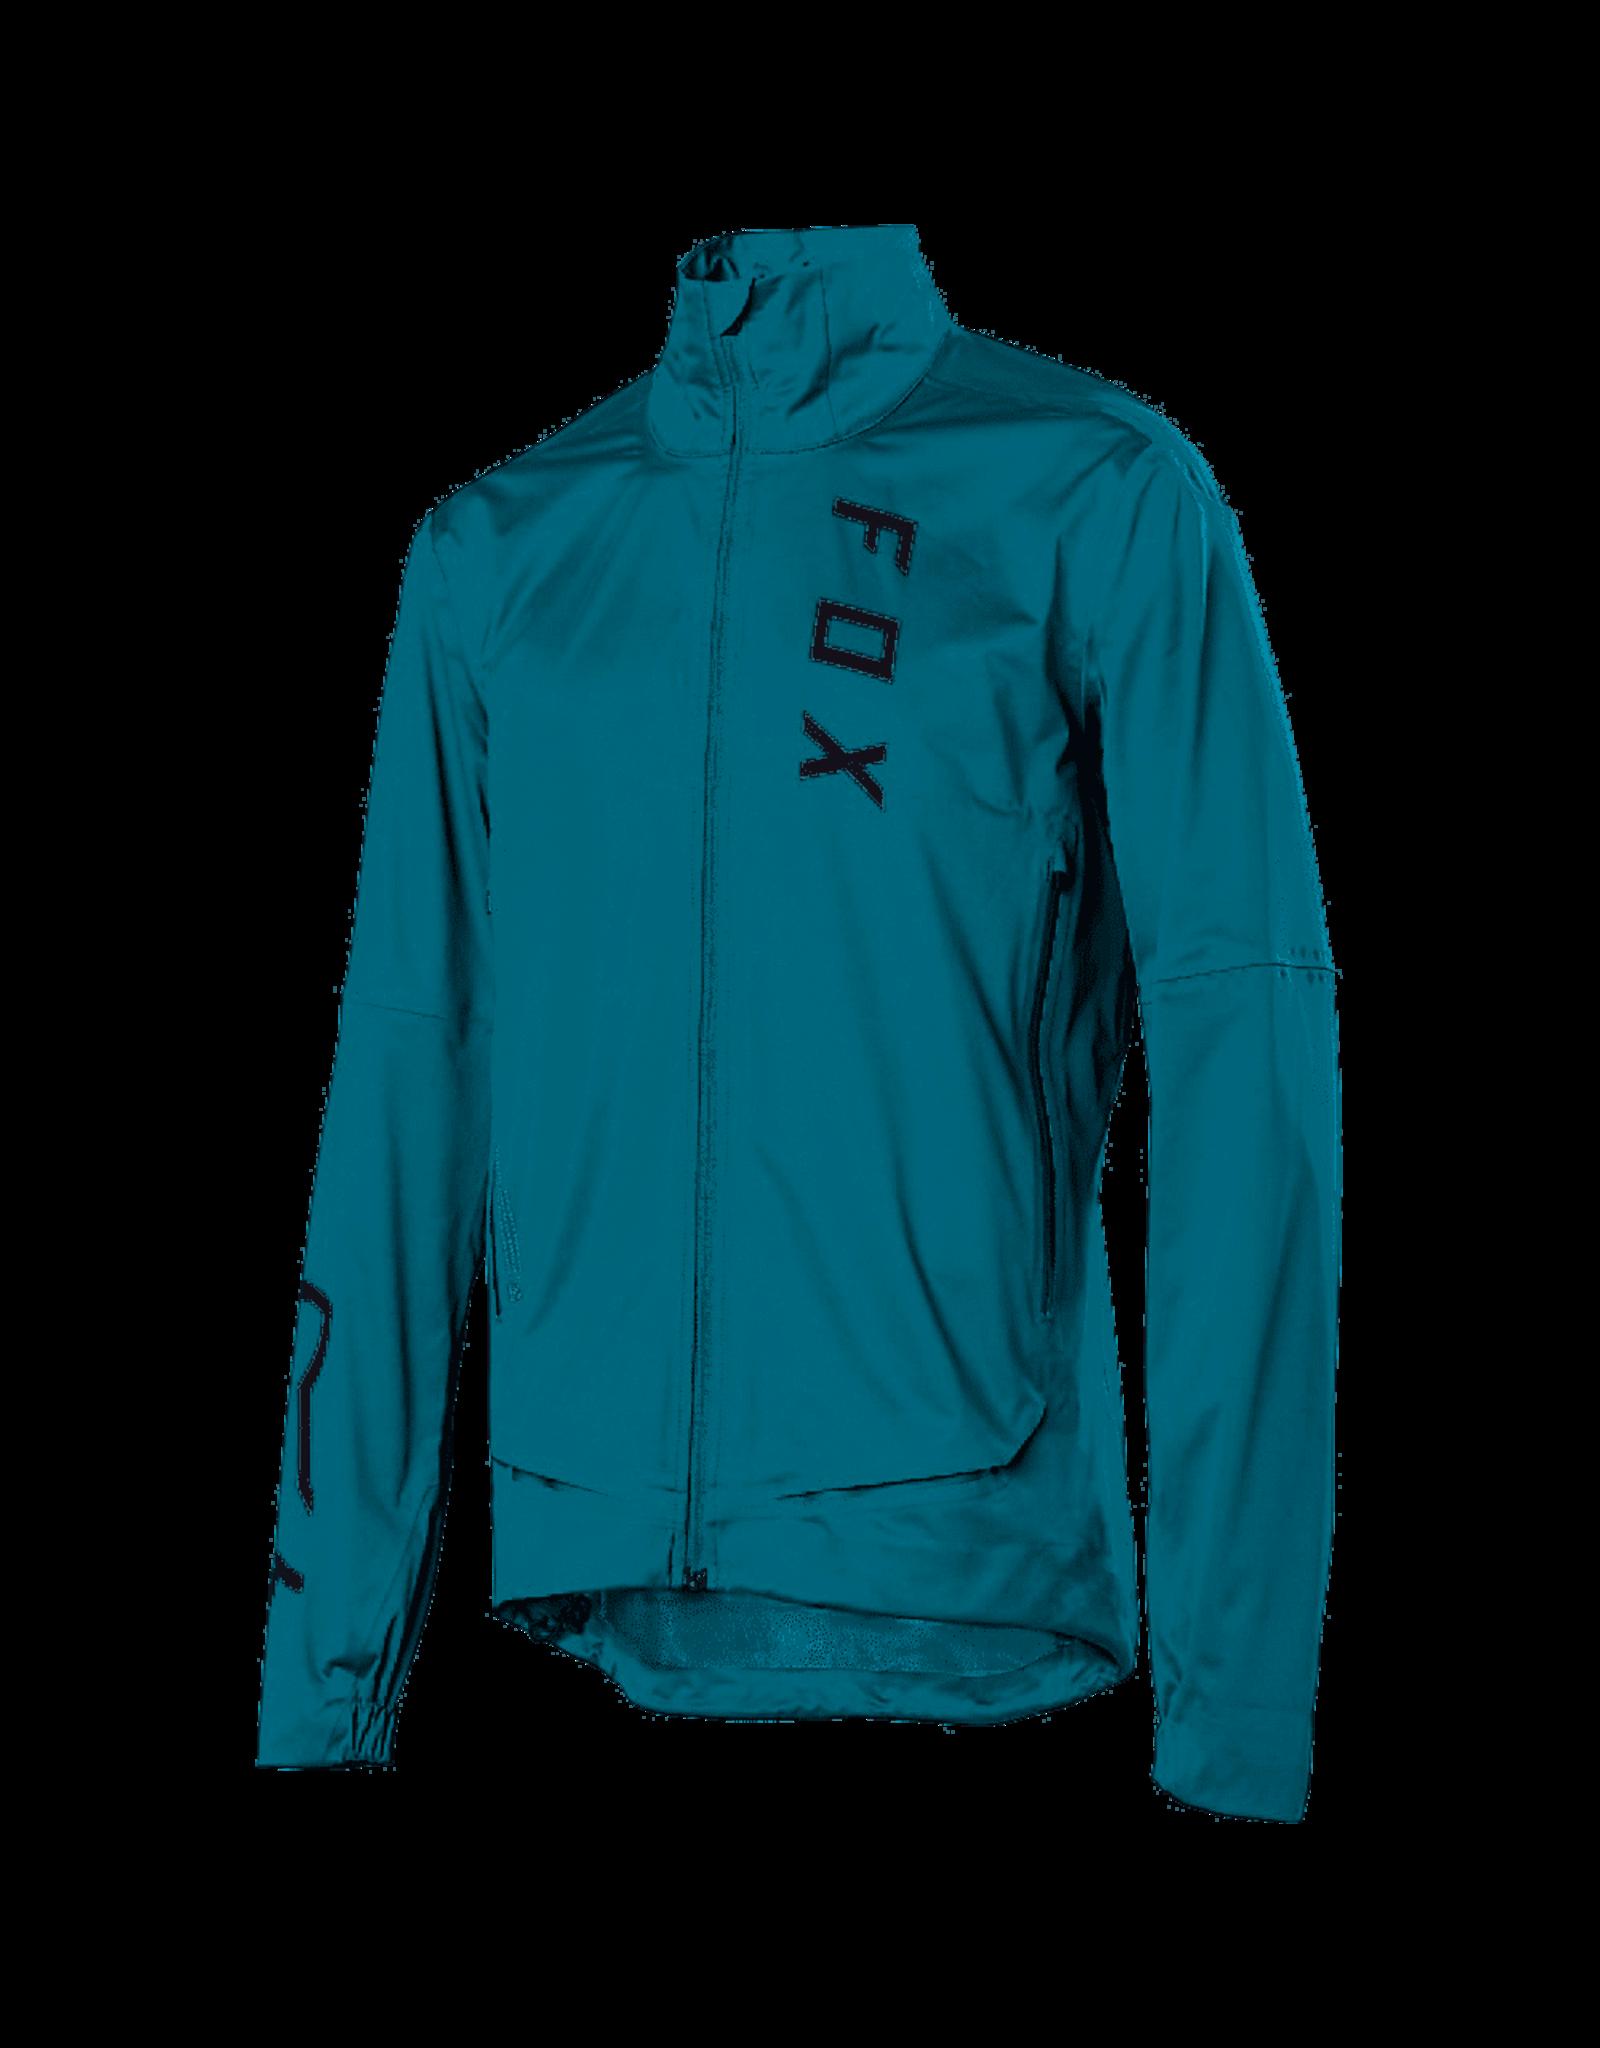 FOX HEAD CLOTHING FOX RANGER 3L WATER JACKET MAUI BLUE (Reg price $229.95)